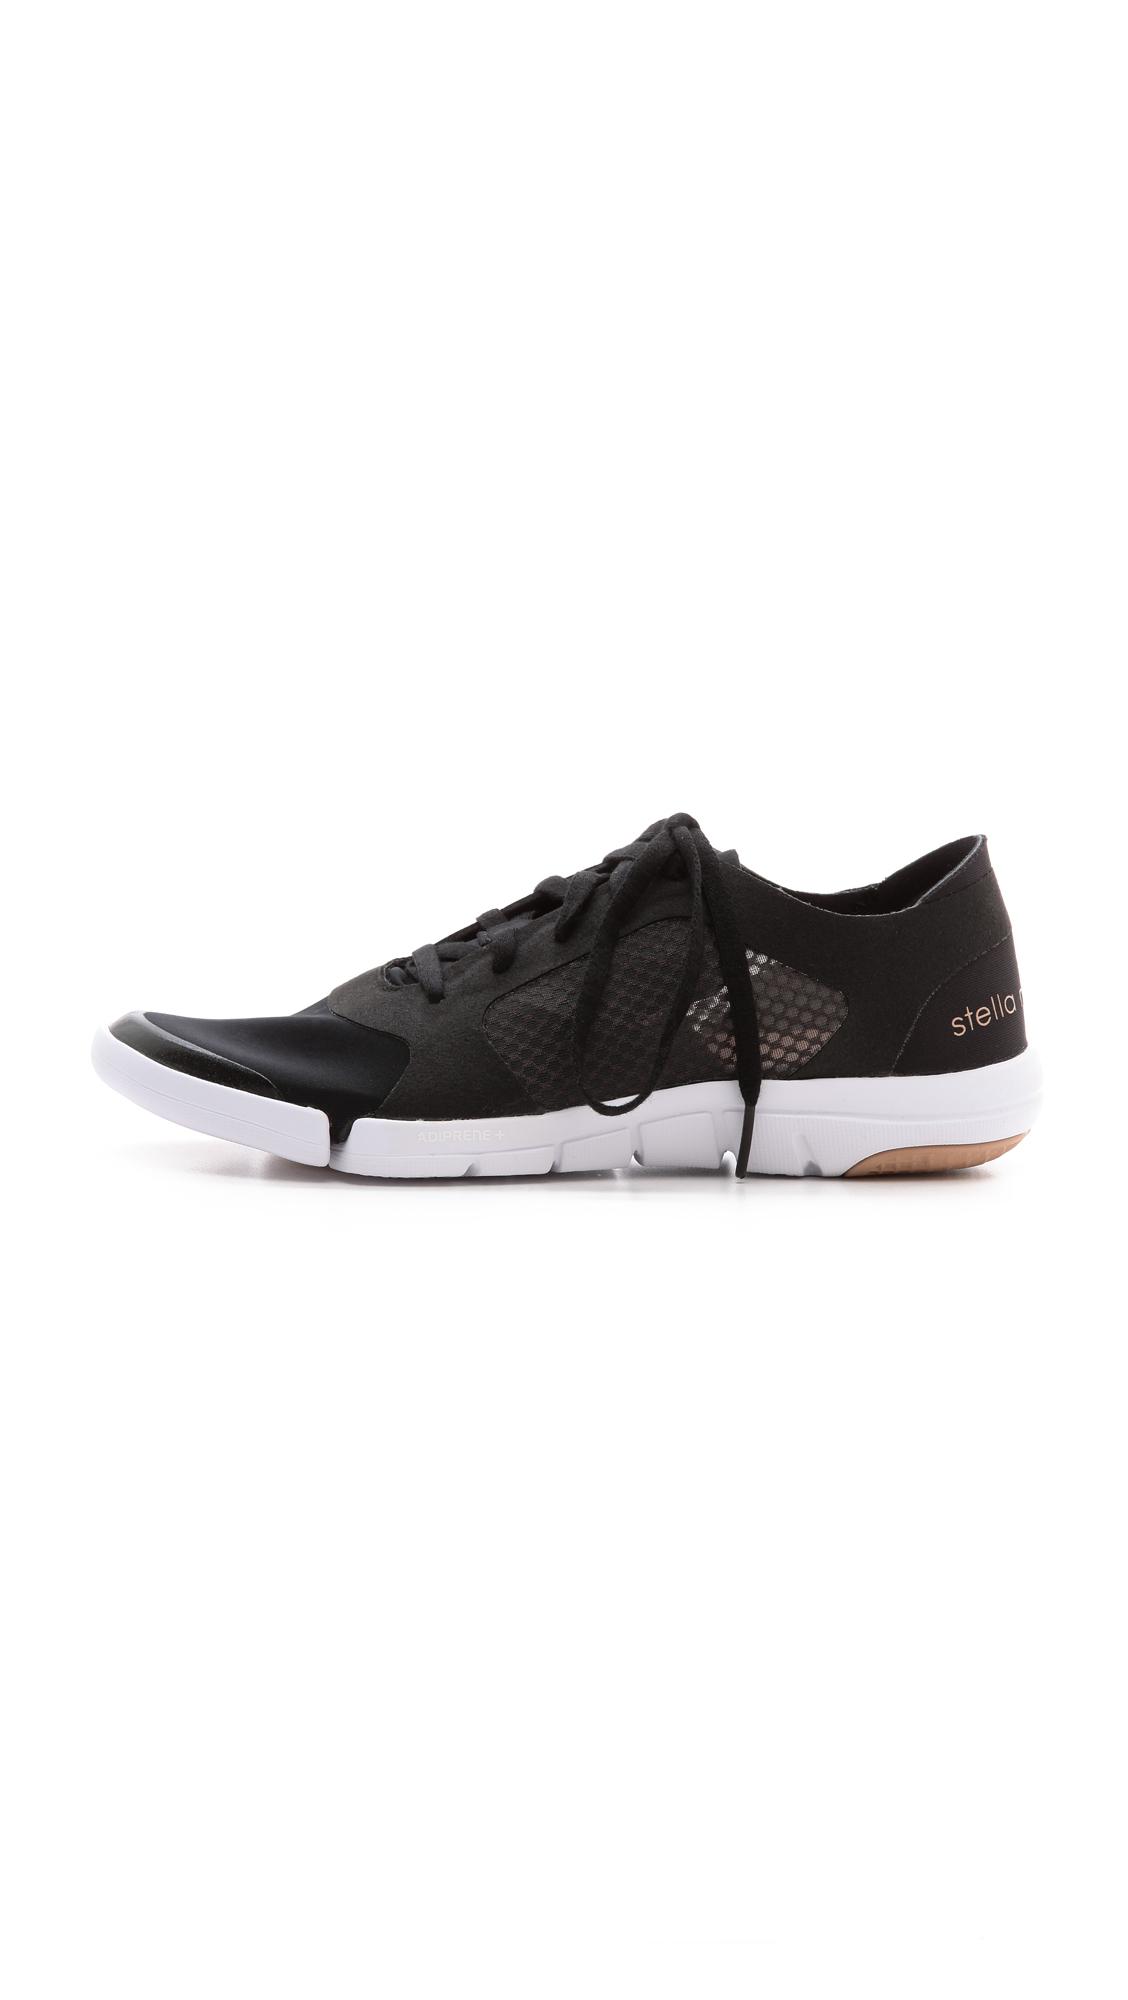 adidas By Stella McCartney Ararauna Dance Sneakers - Black/Raven/Rose Tan